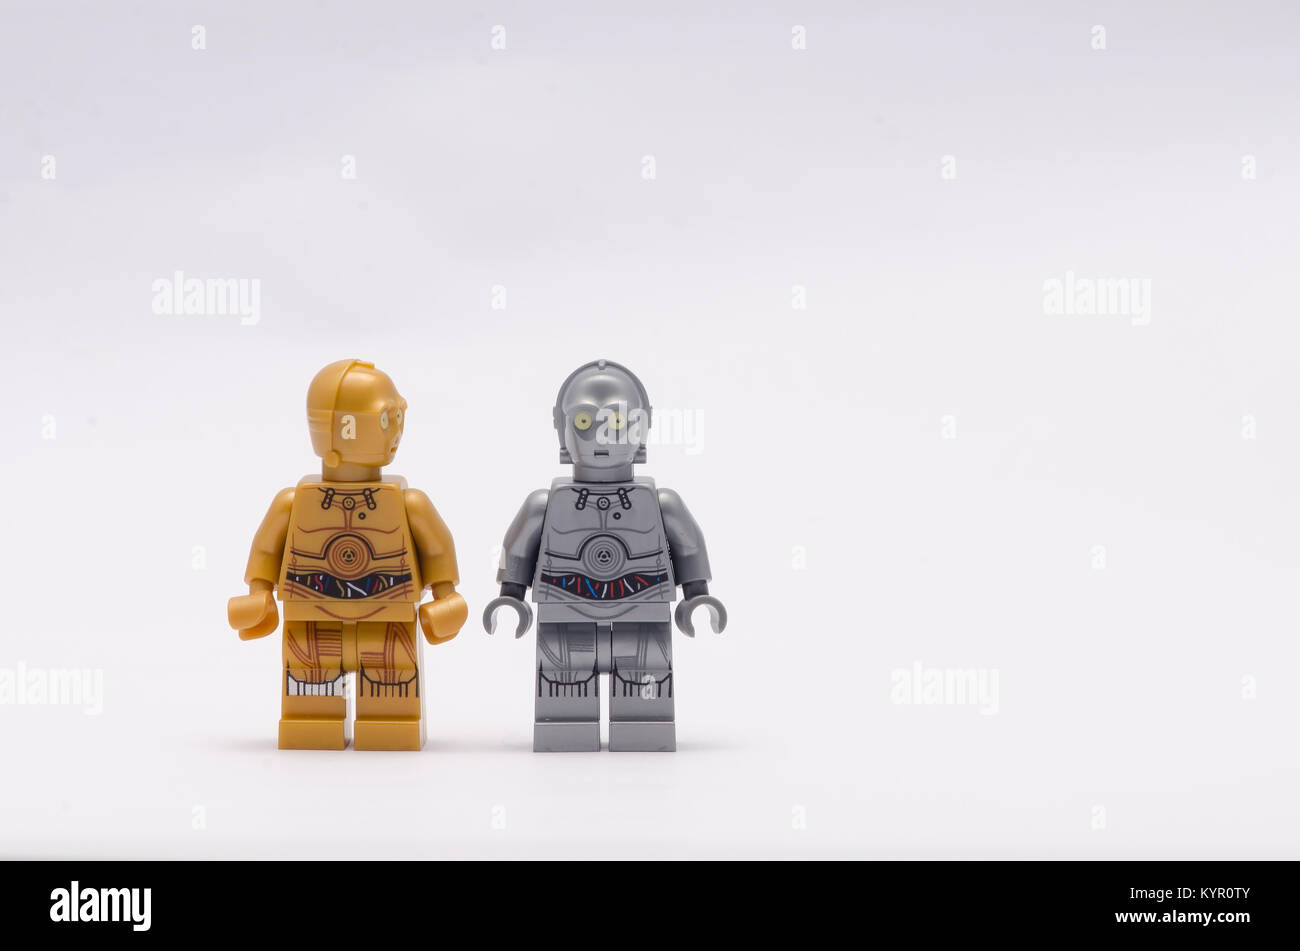 LEGO Star Wars Lobot Minifigure